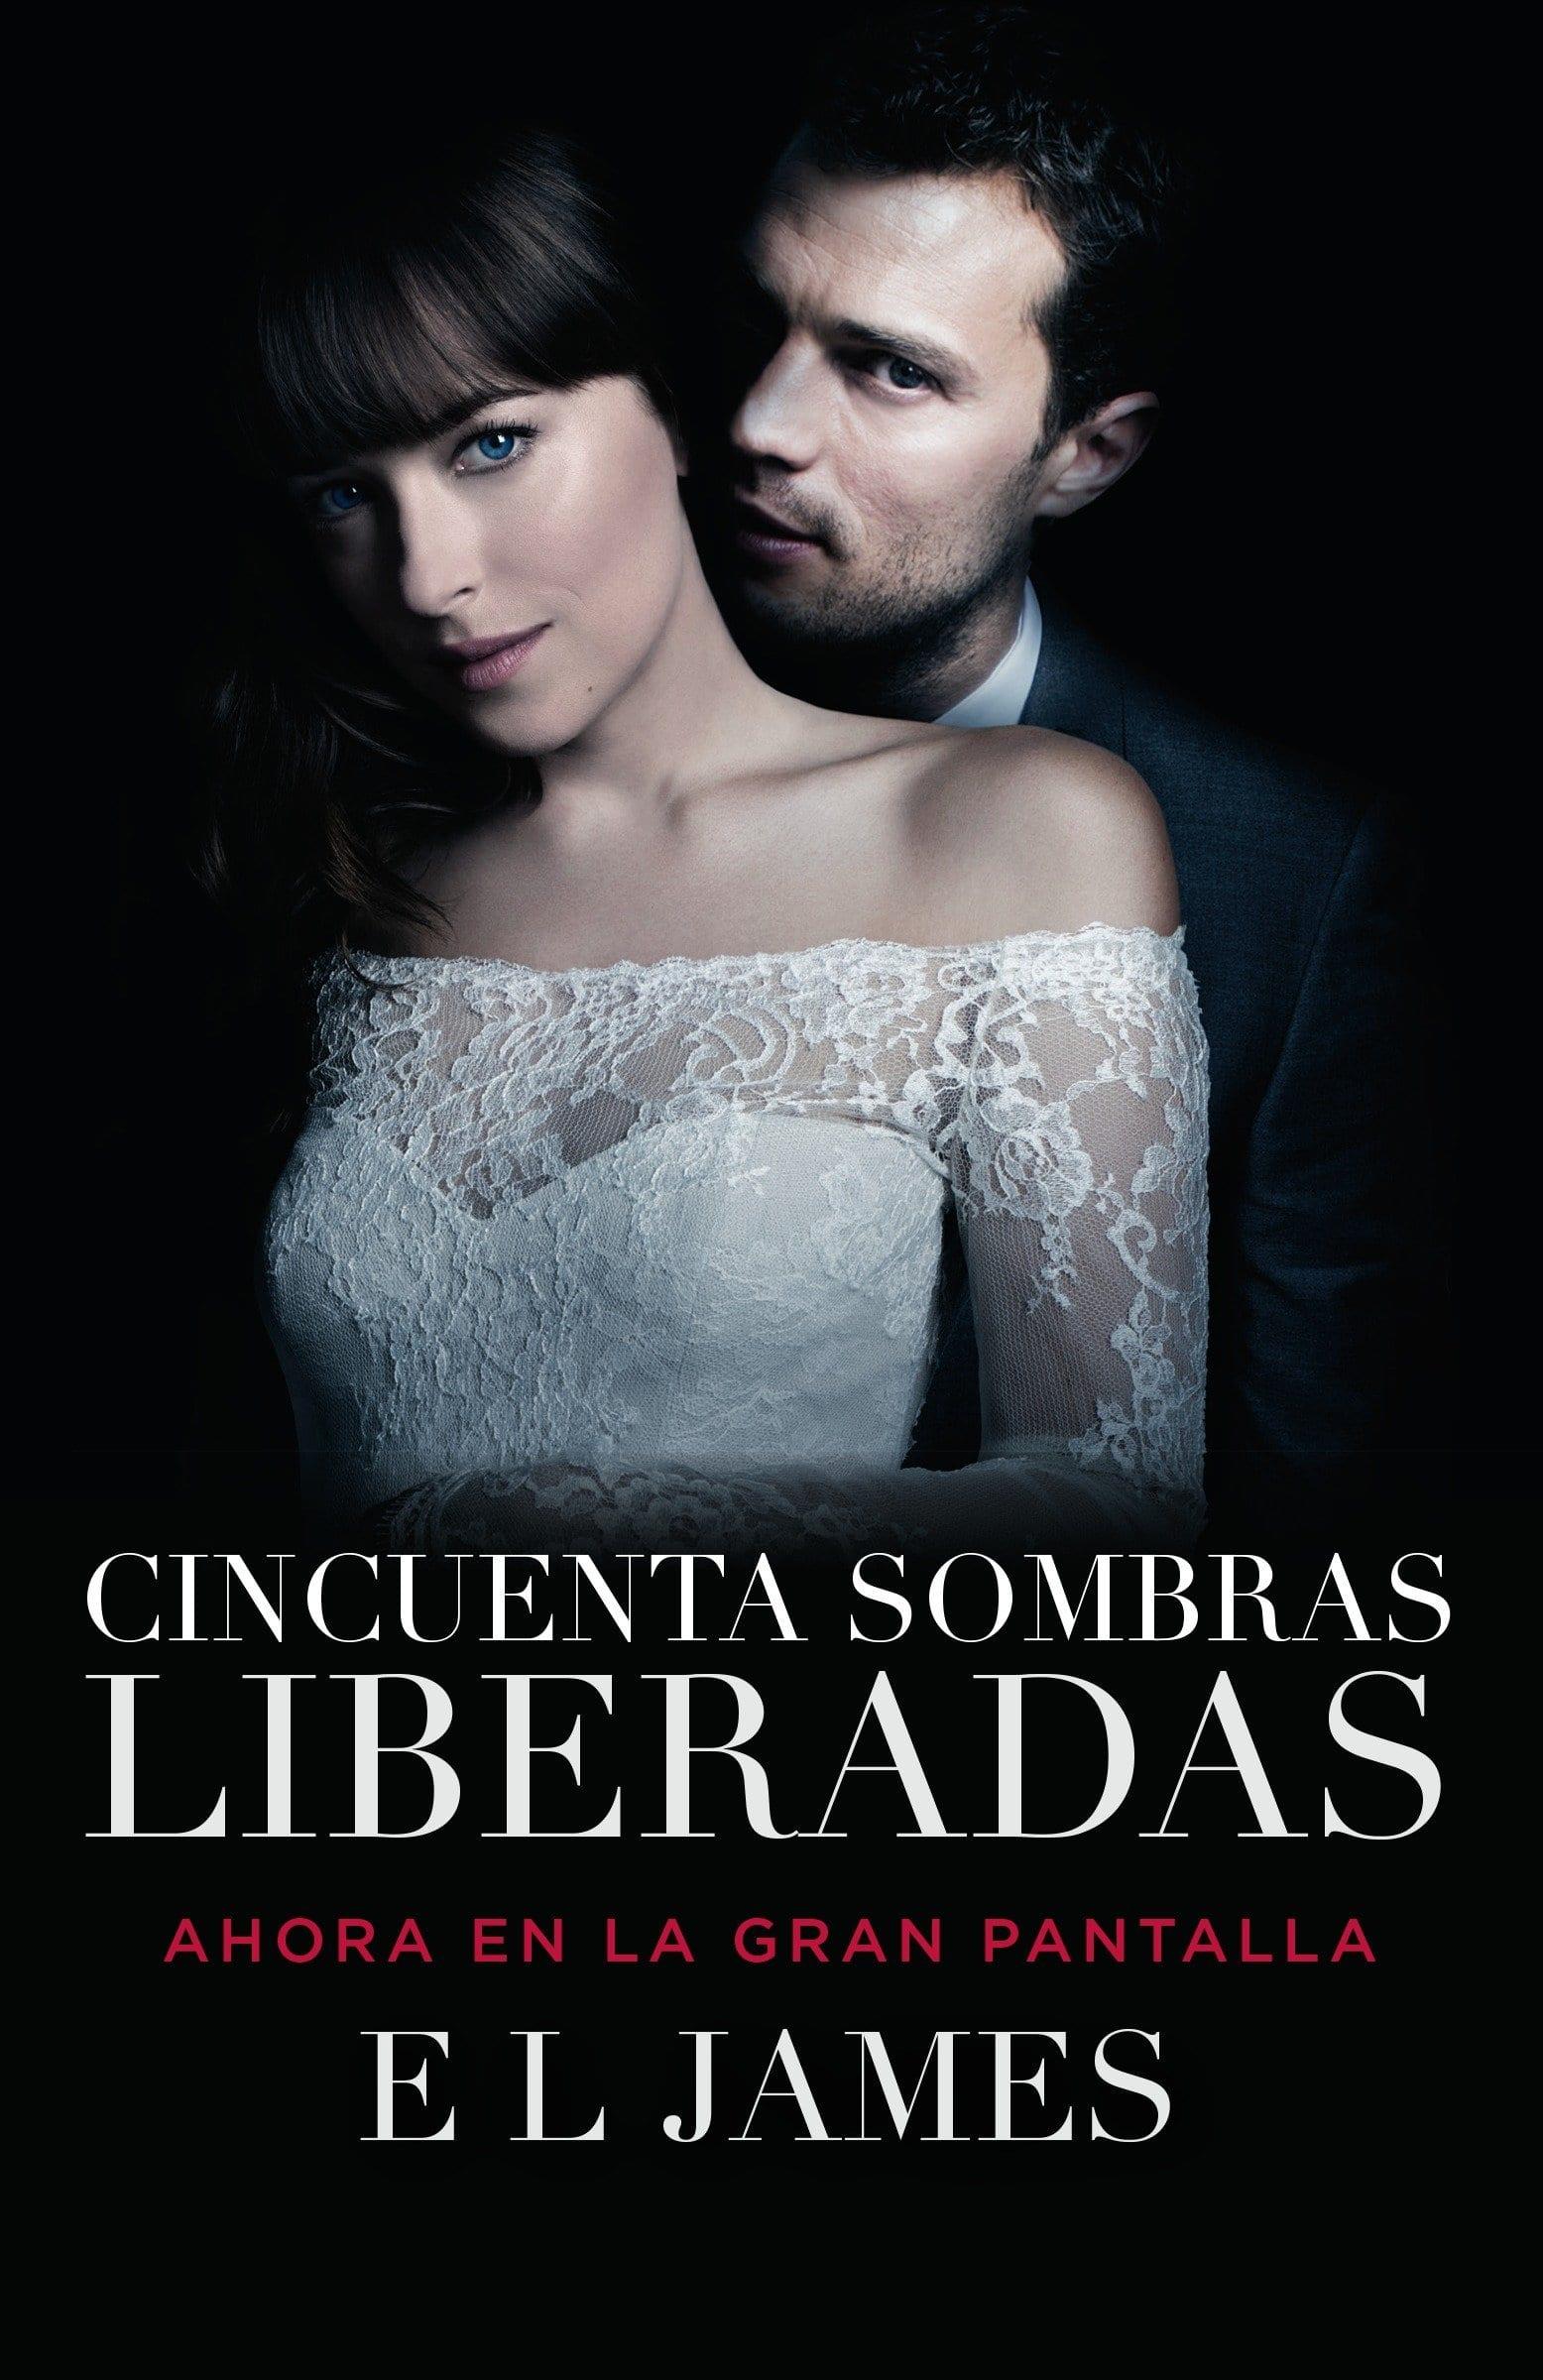 Crítica de cine: Cincuenta sombras liberadas